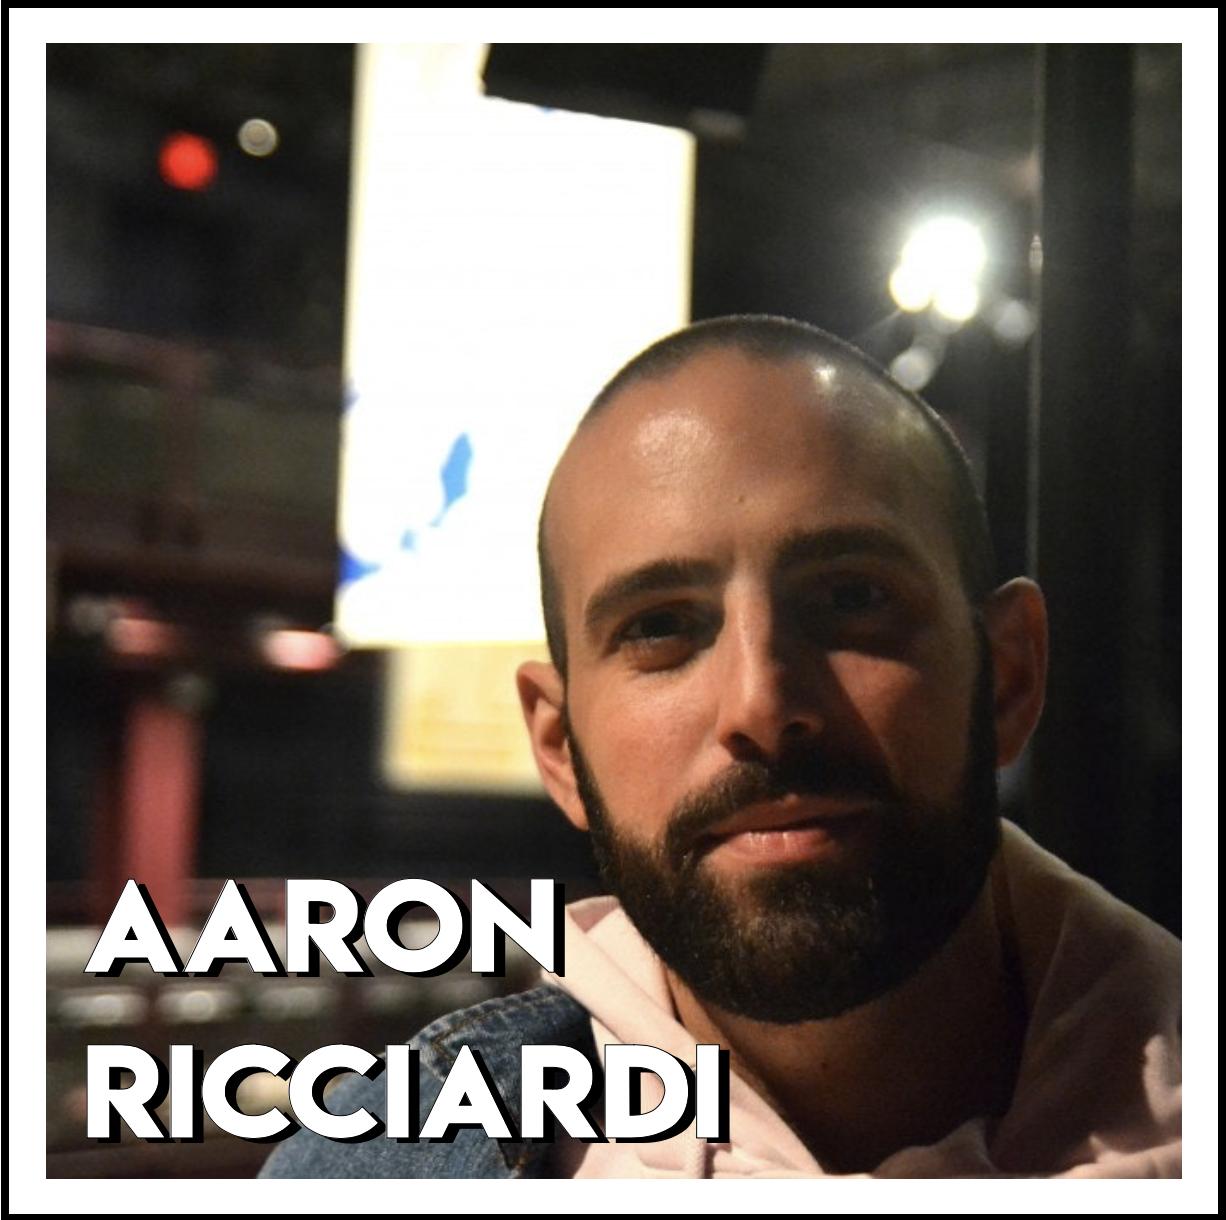 Aaron Ricciardi